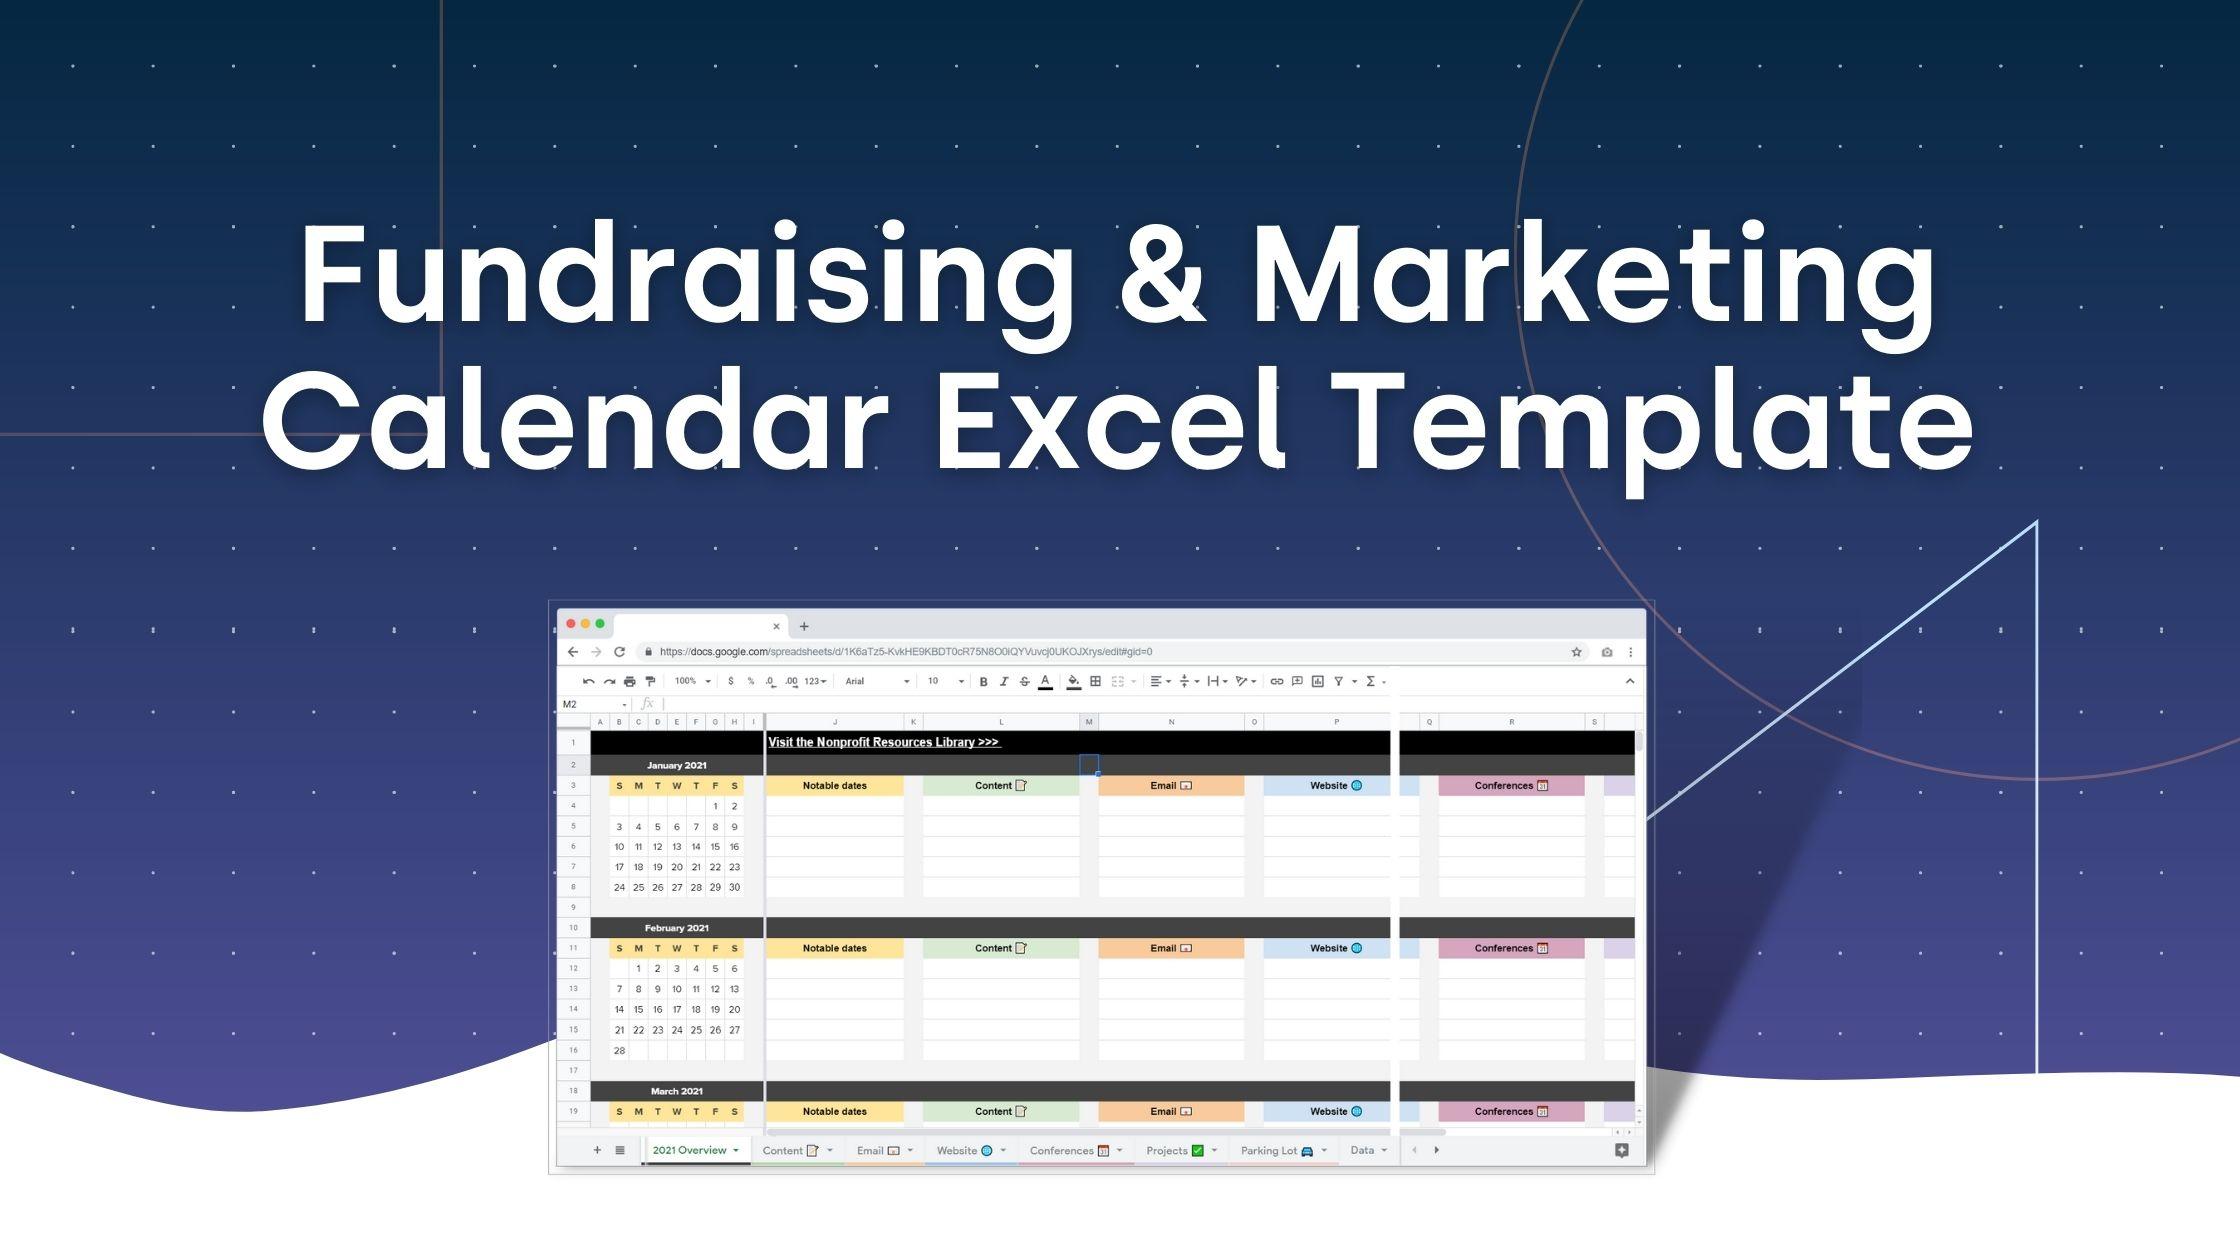 Marketing Calendar Template for Nonprofits (Excel Spreadsheet / Google Sheets)